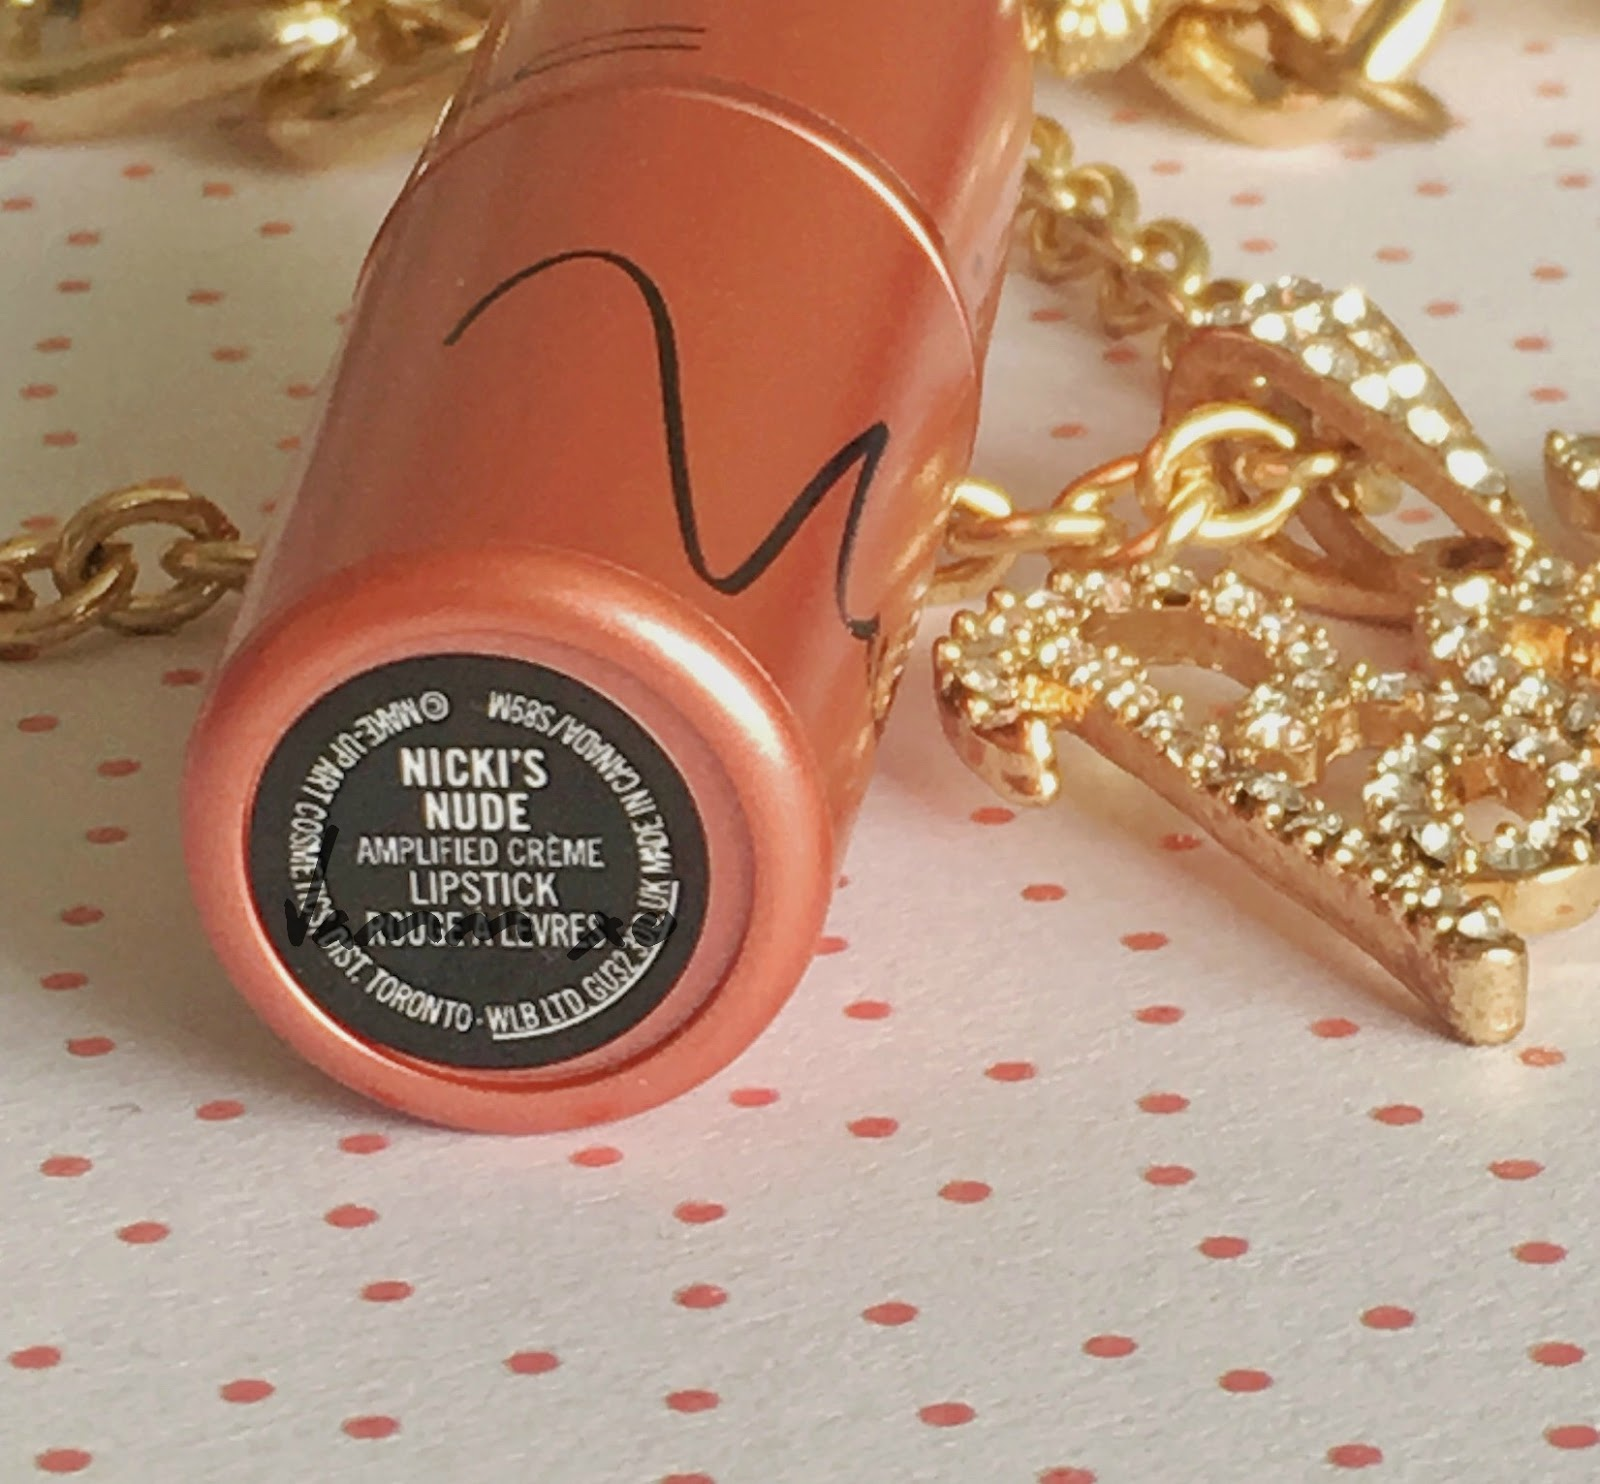 Beauty Jamm xo: MAC x Nicki Minaj 2017 Custom-Made